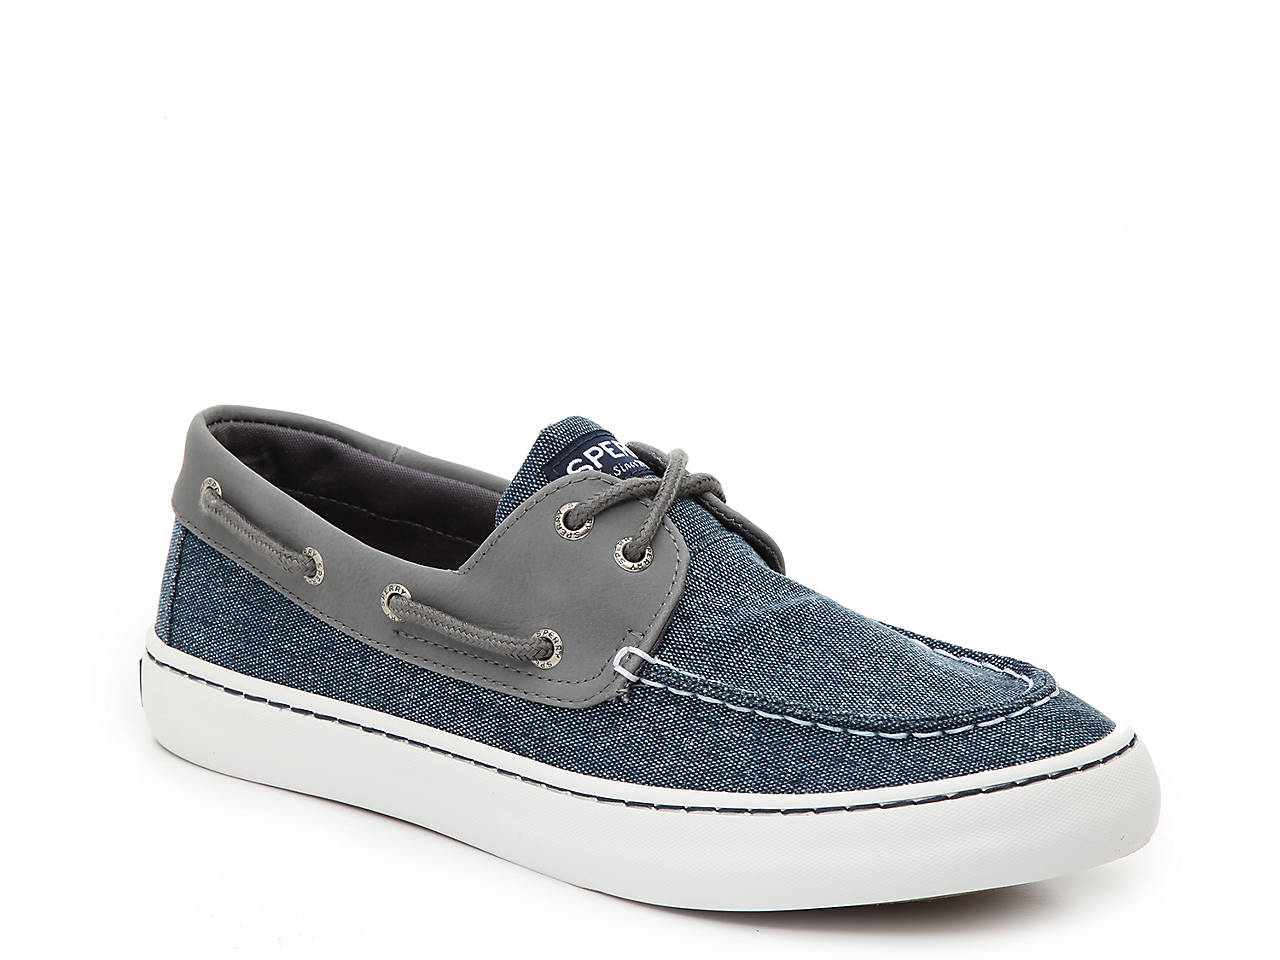 5c4cf61e441d Sperry Top Sider Cutter Boat Shoe Men S Shoes Dsw